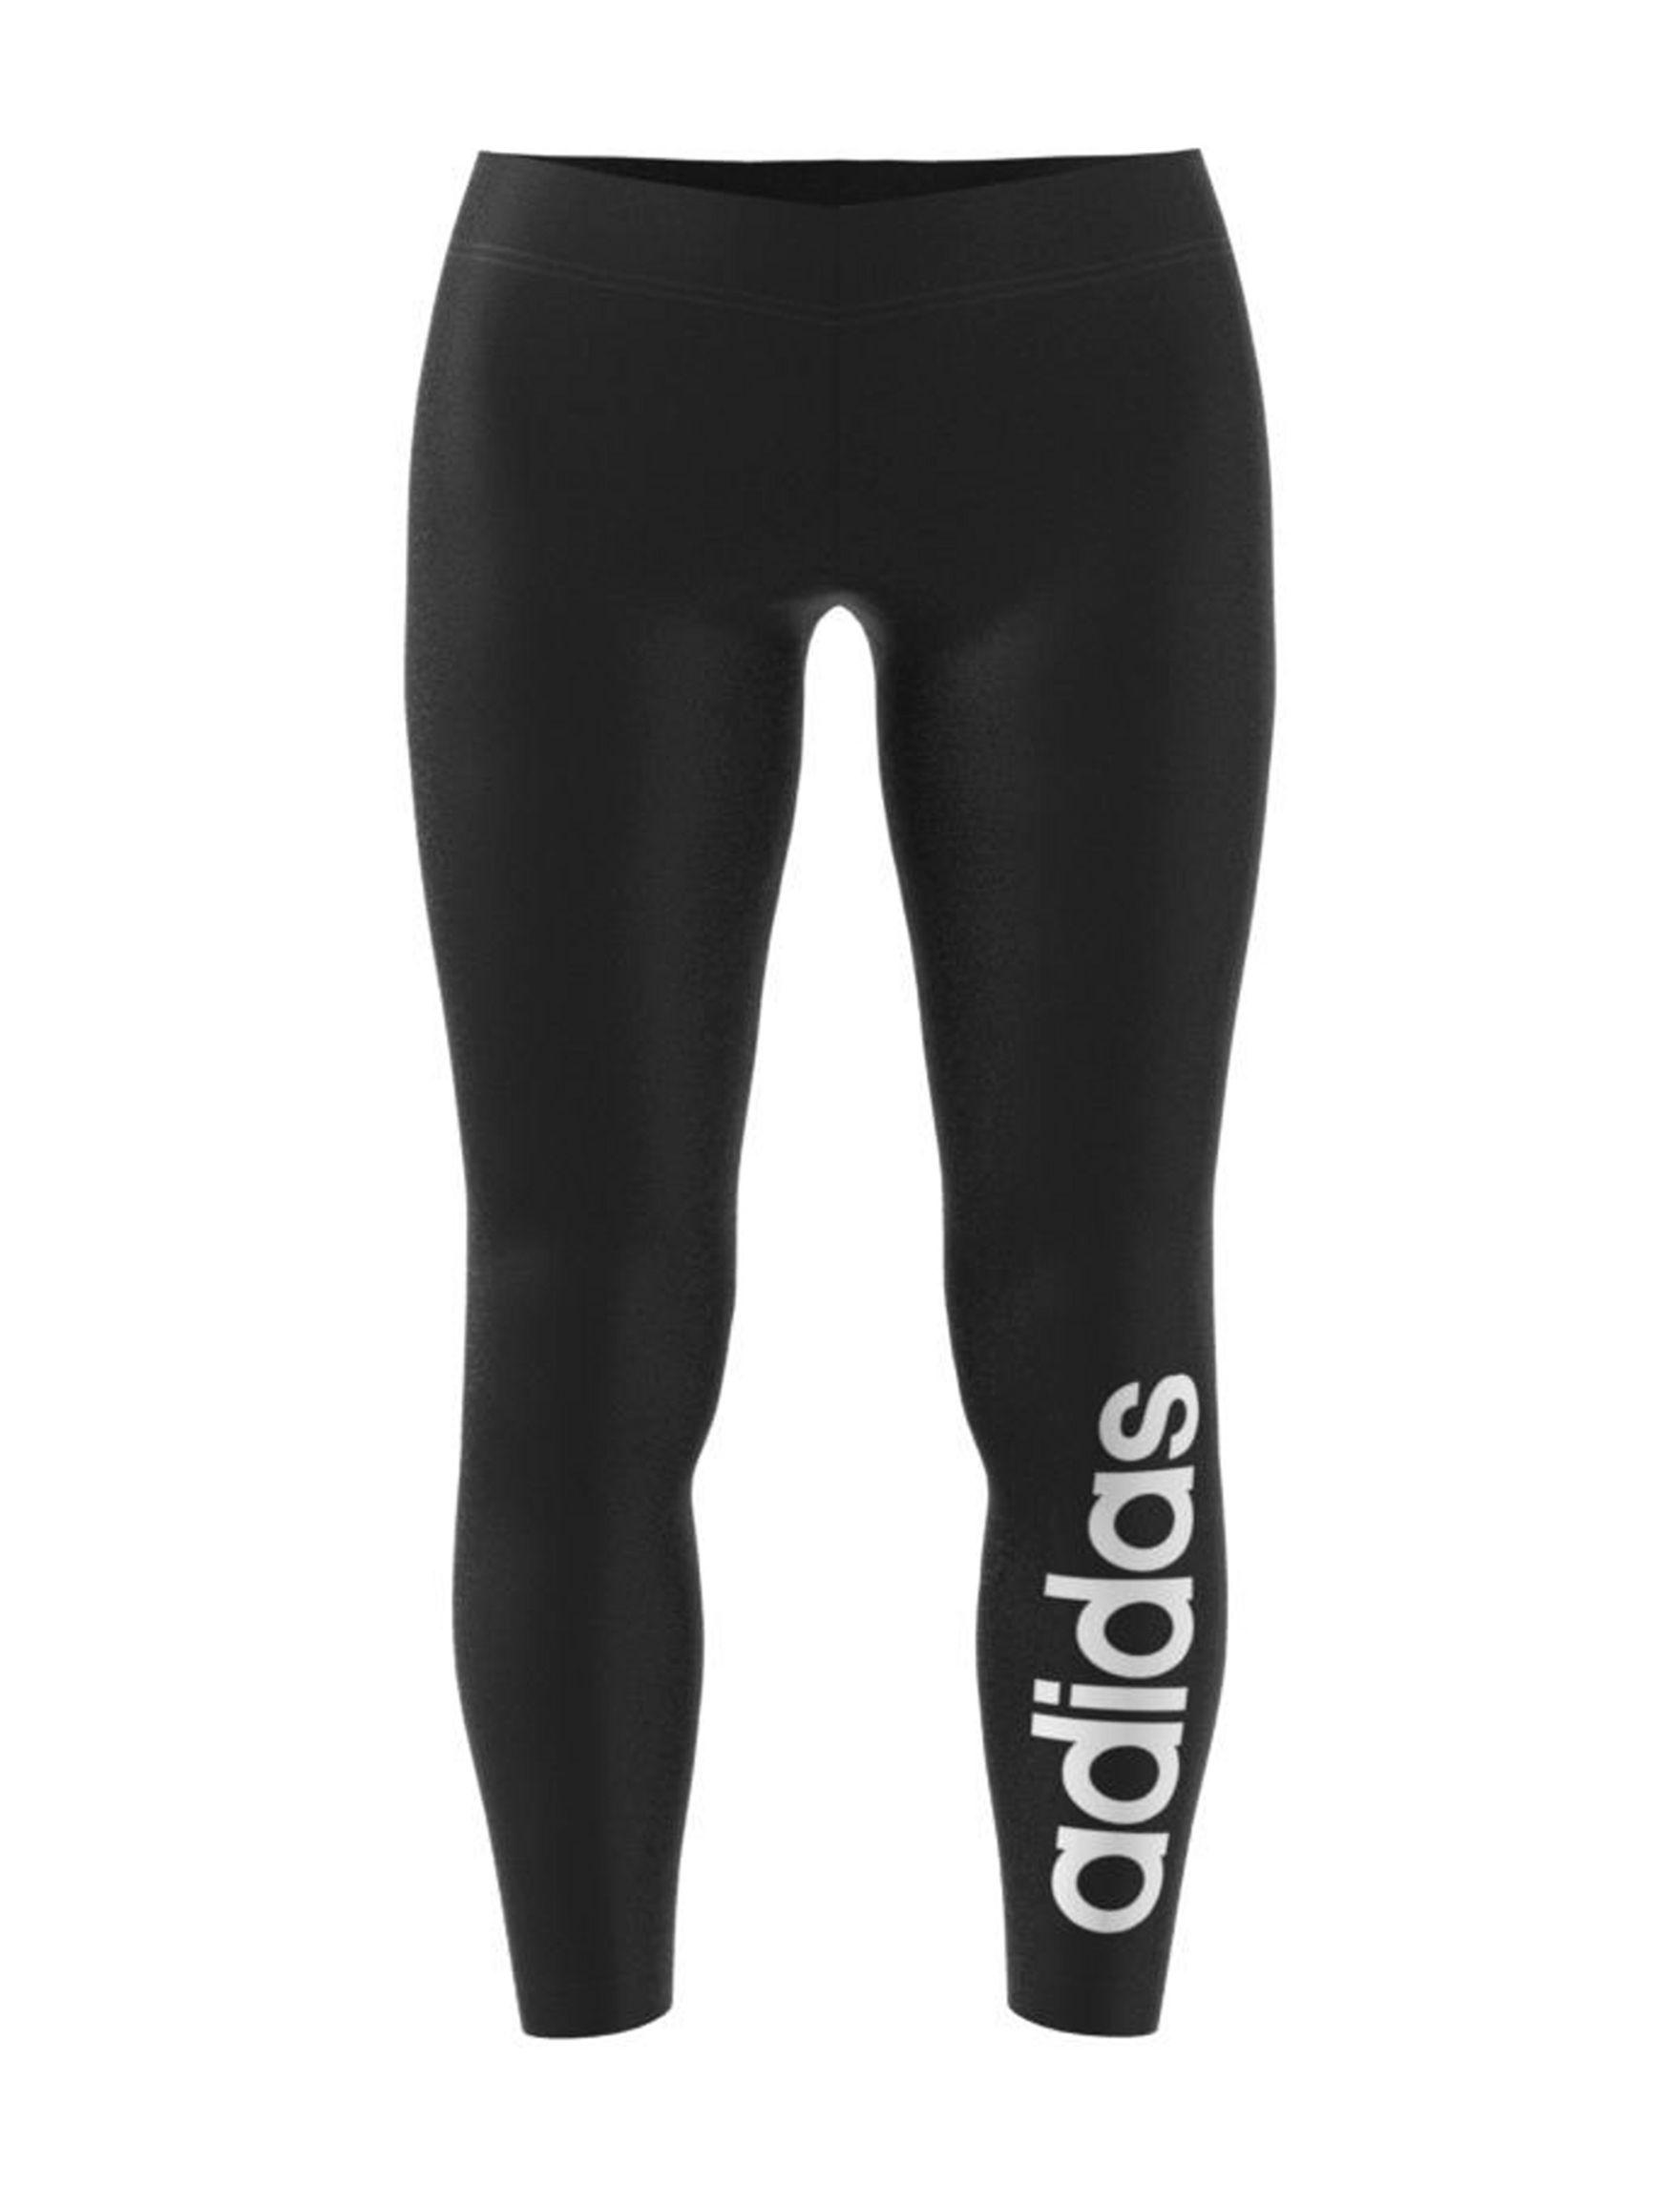 Adidas Black / White Active Leggings